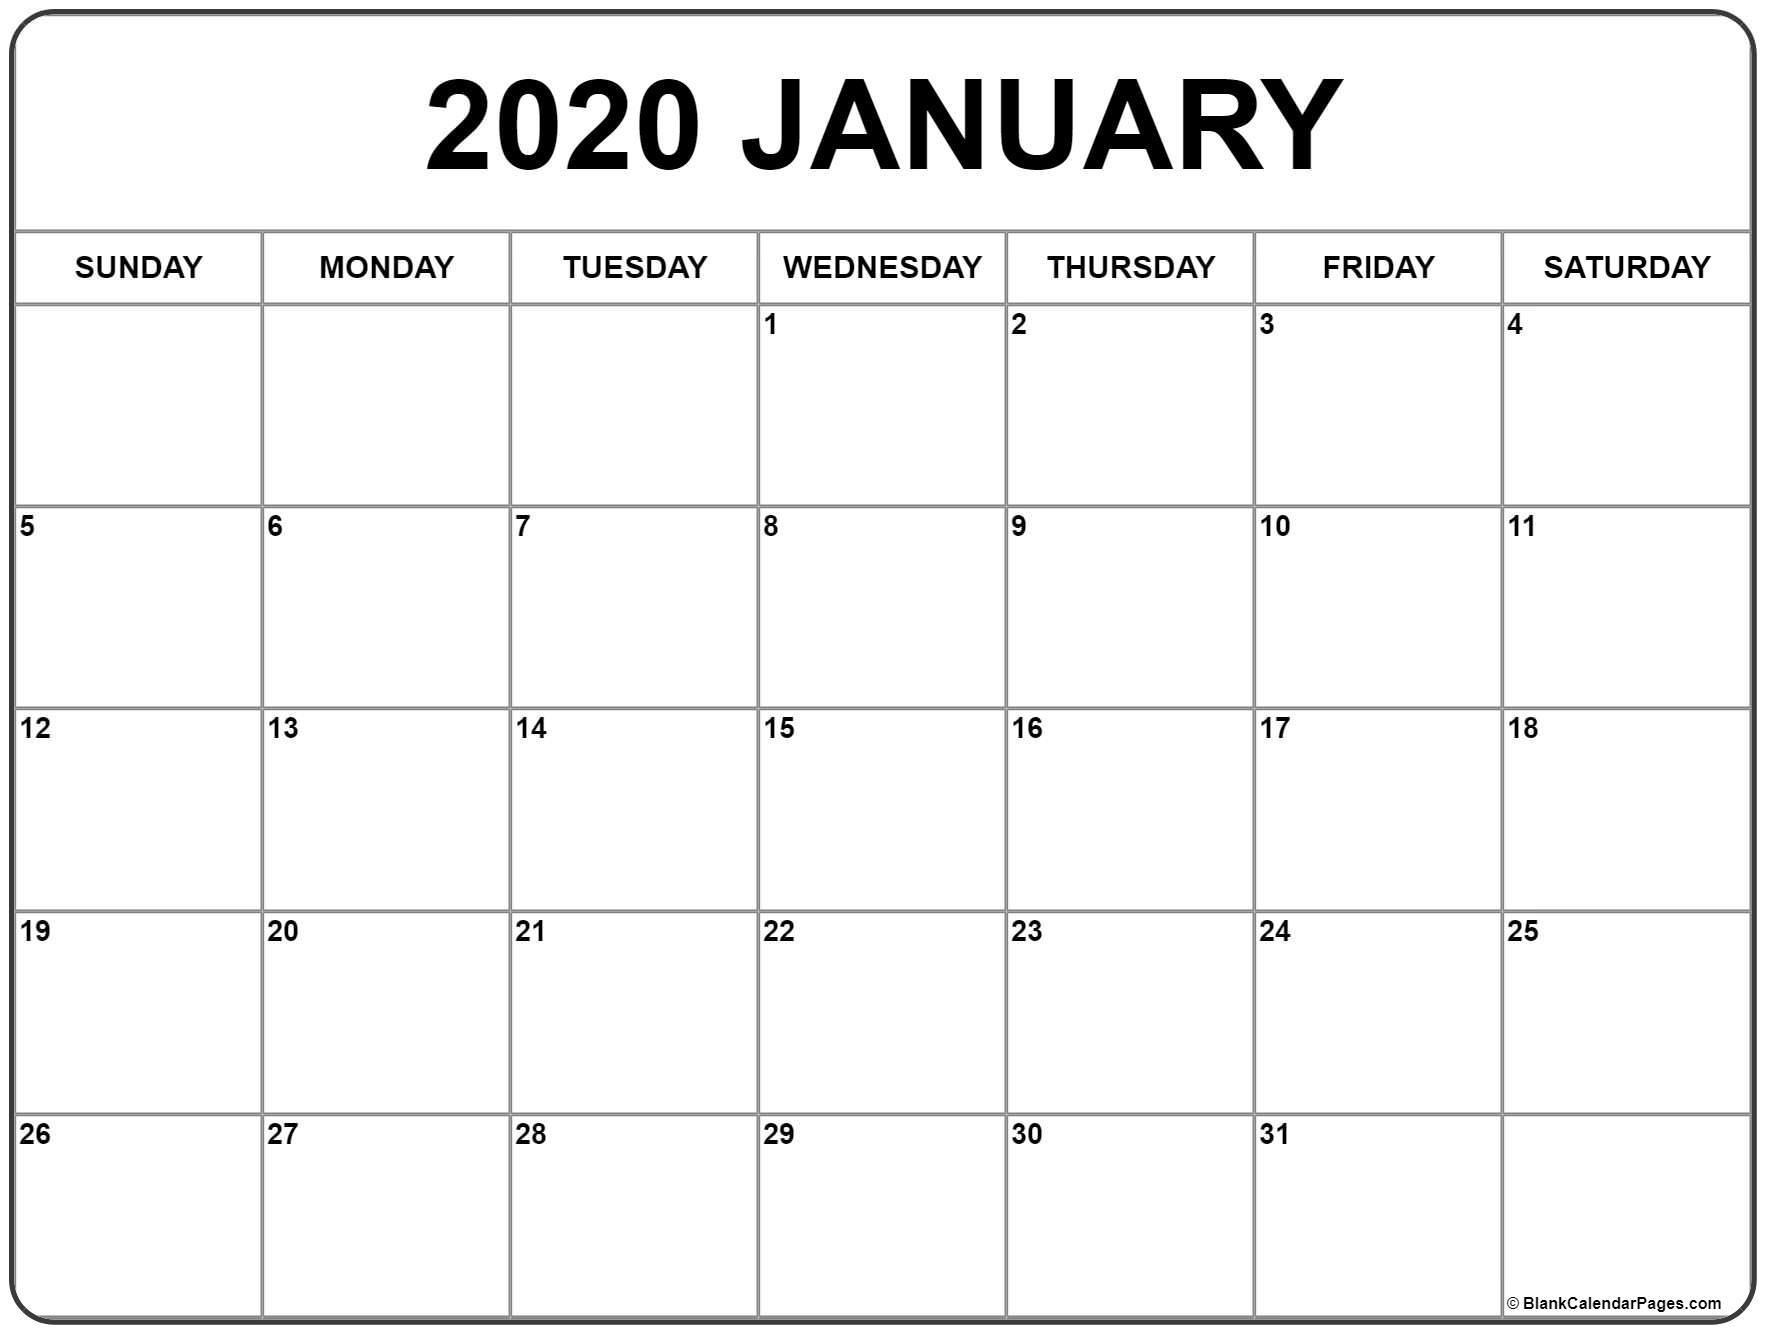 January 2020 Calendar Blank Appointments » Creative Calendar Ideas_Free Calendar Blank 2020